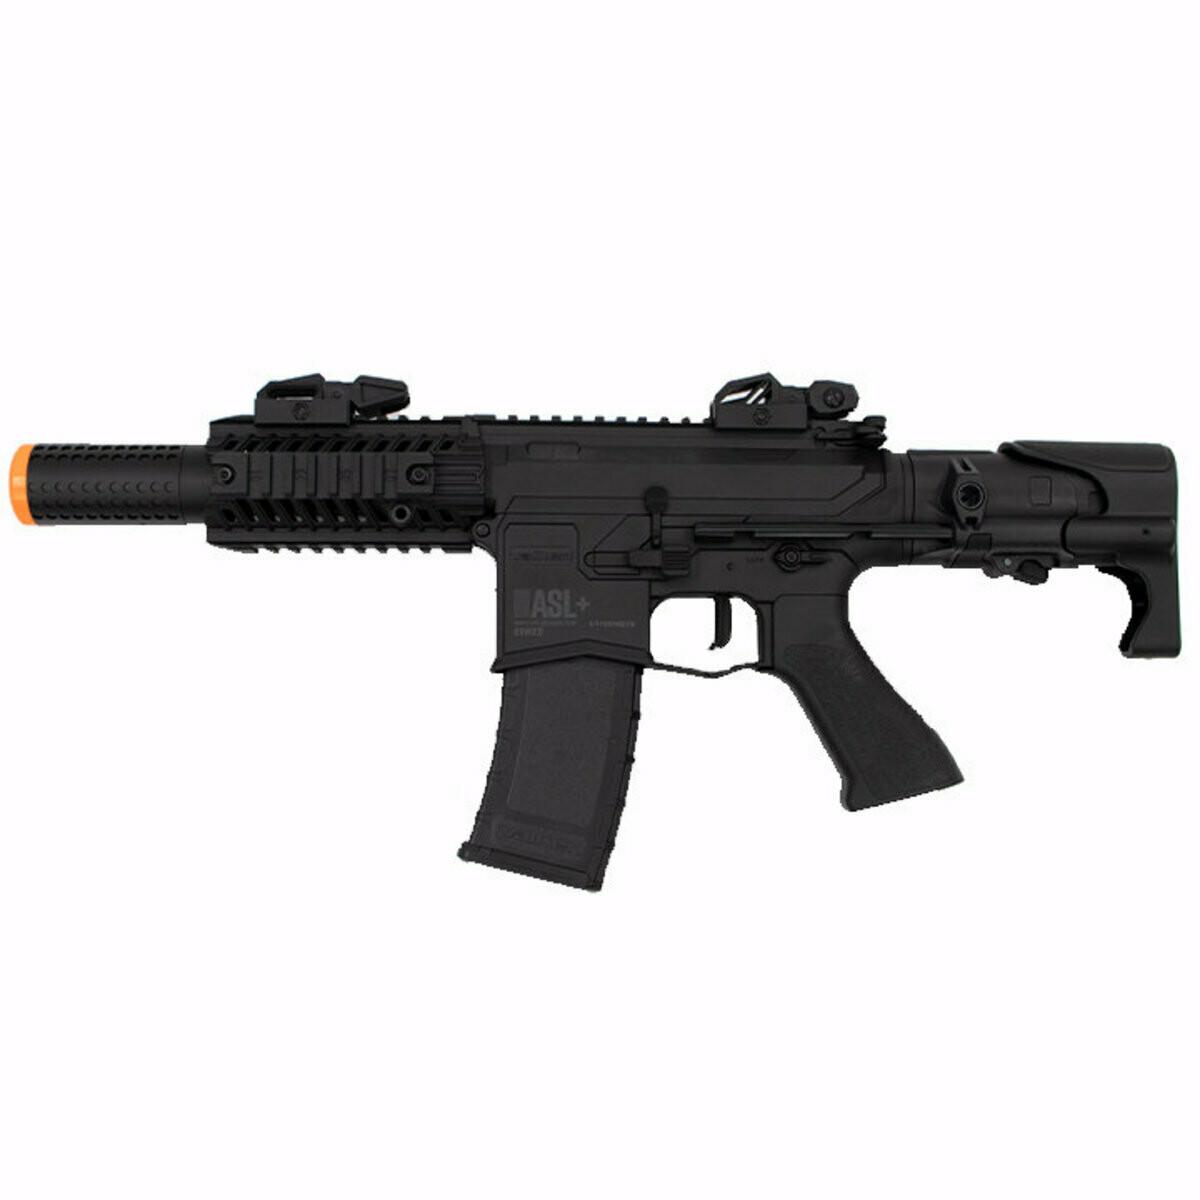 Valken CDN ASL+ Romeo AEG Rifle